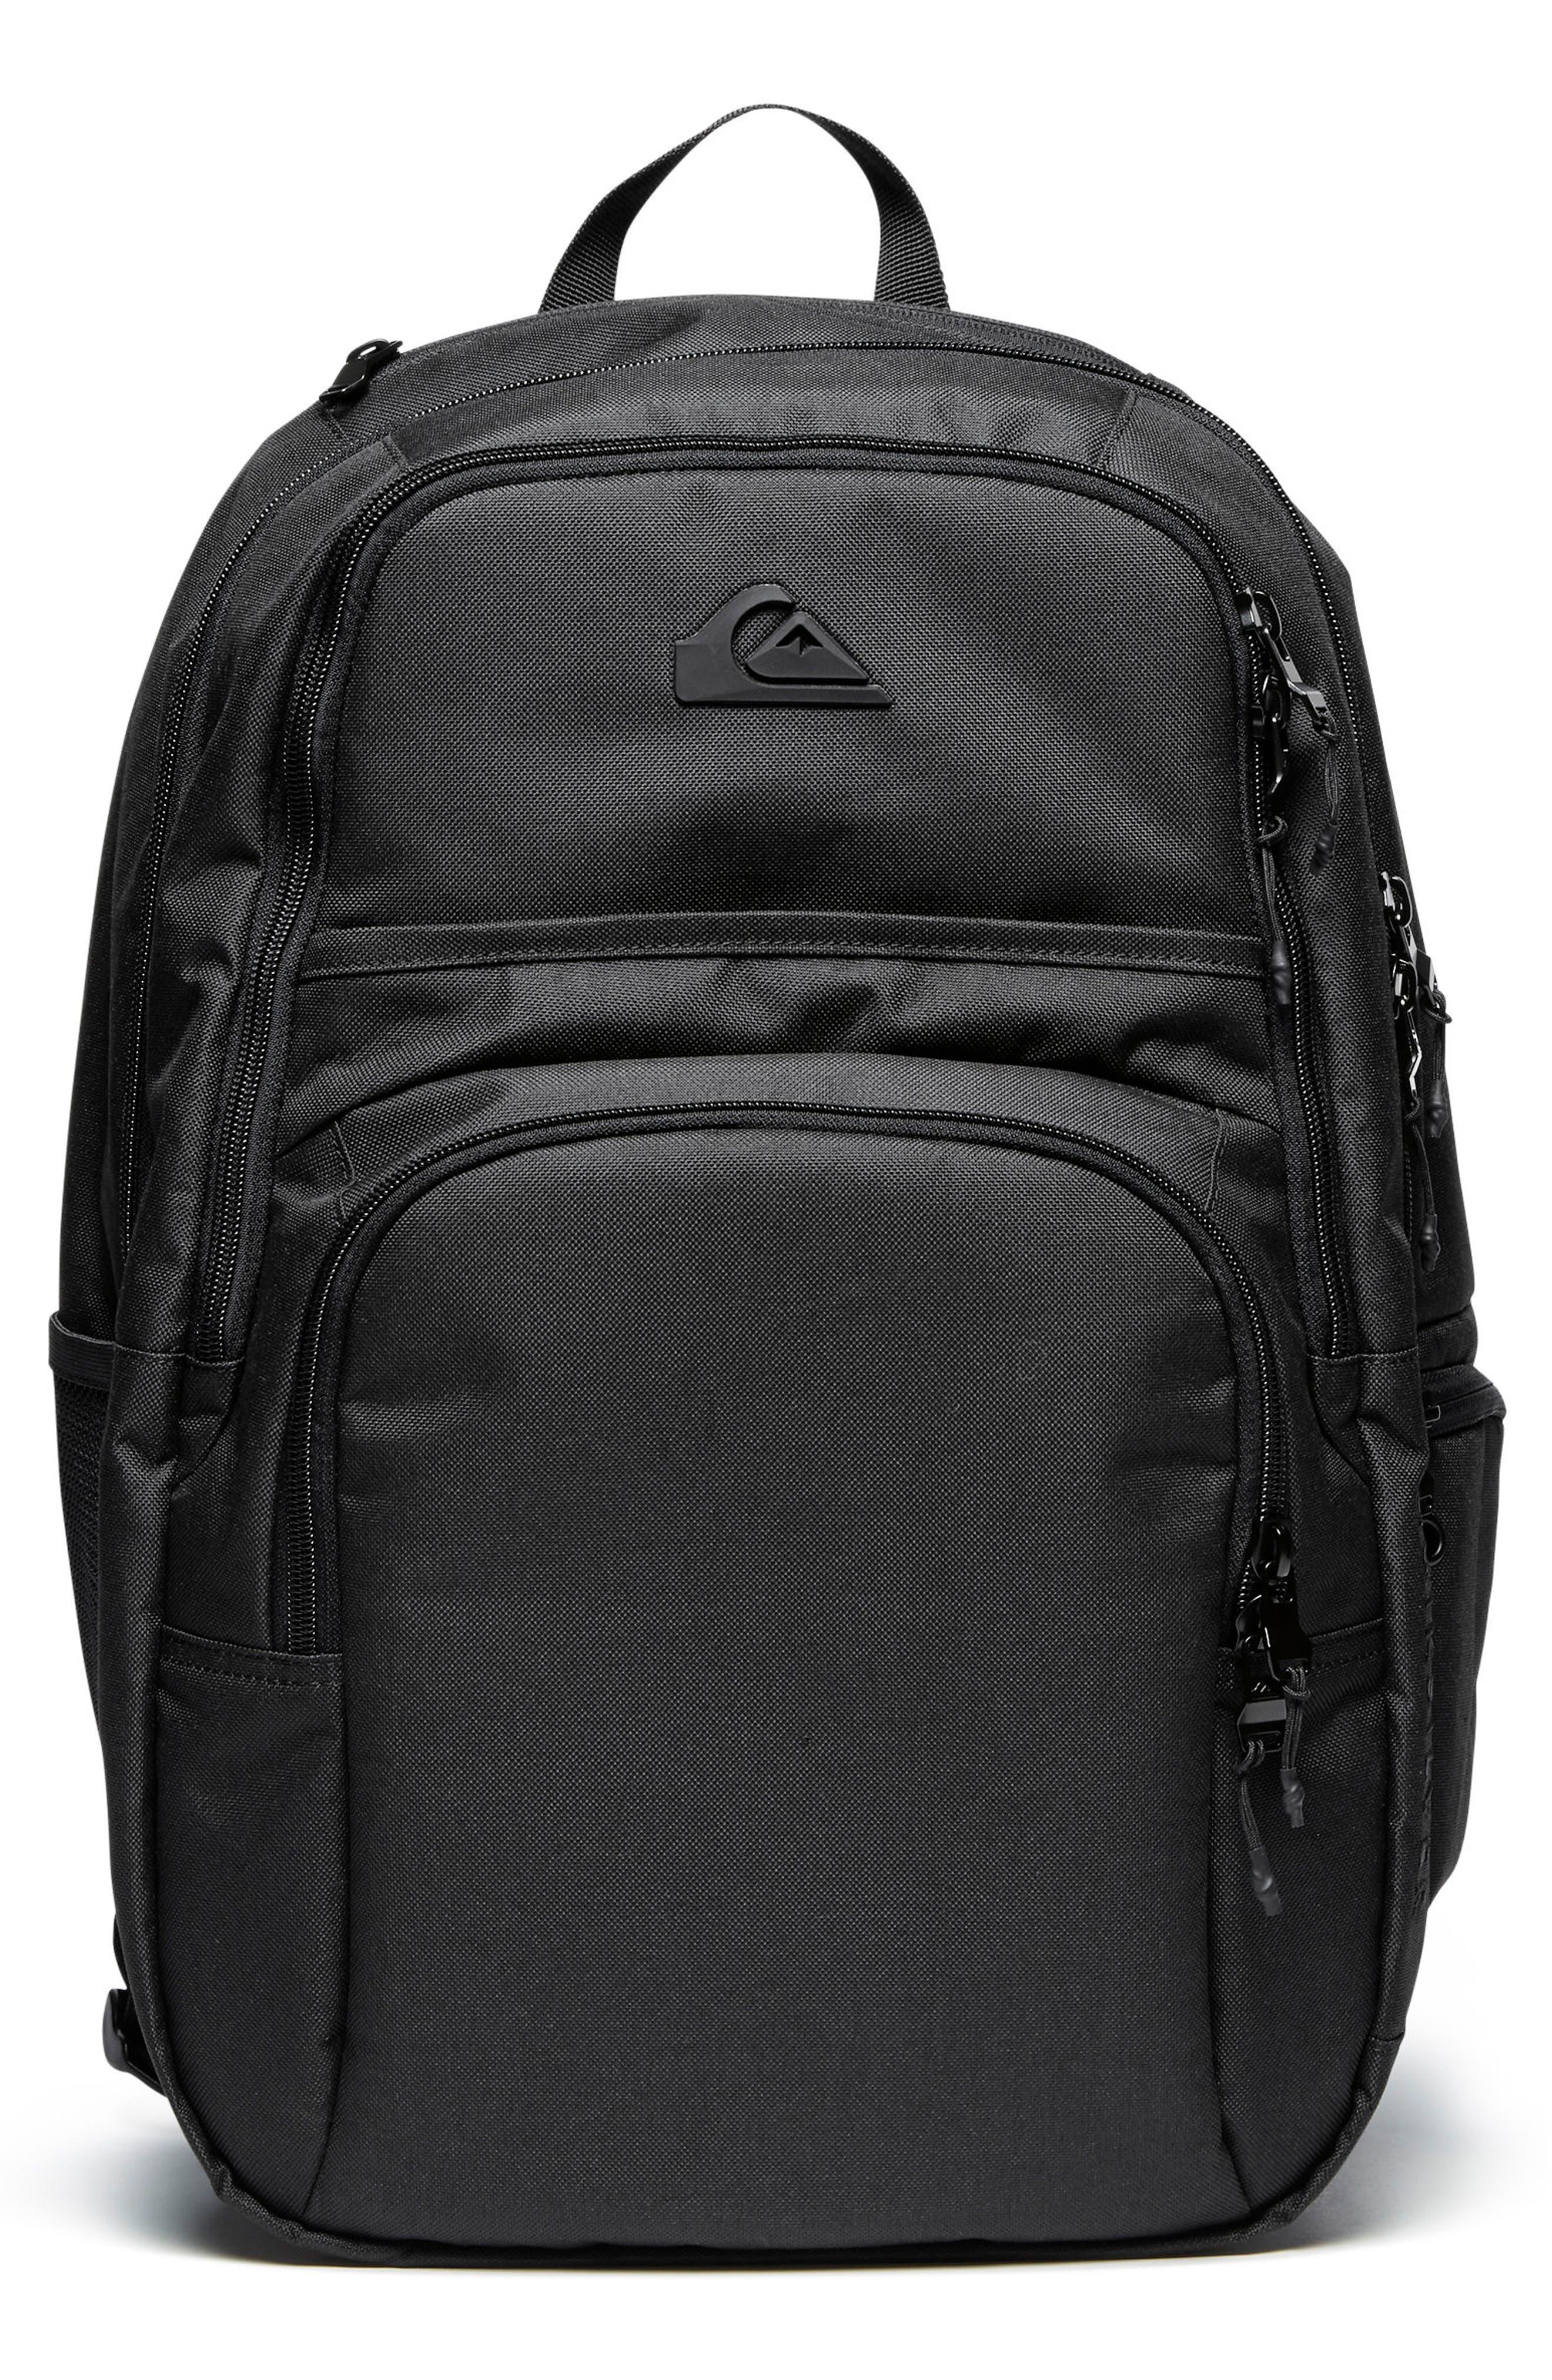 Diaper Backpack,                             Main thumbnail 1, color,                             Black